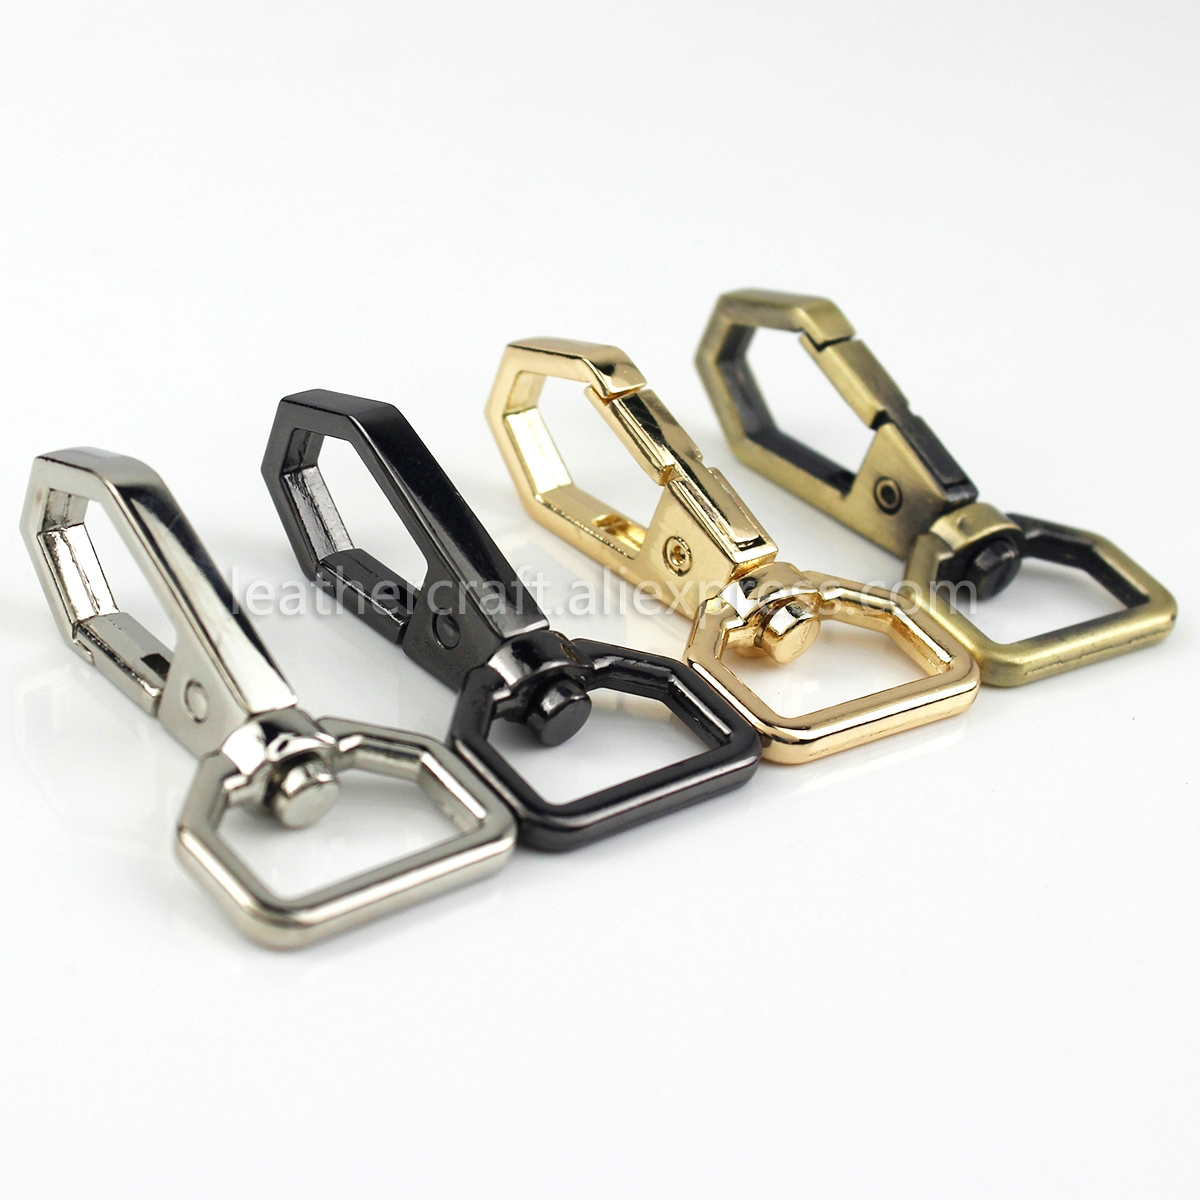 Zinc Alloy Bag Belting Pets Dog Strap Trigger Snap Lobster Clasp Hook 10pcs